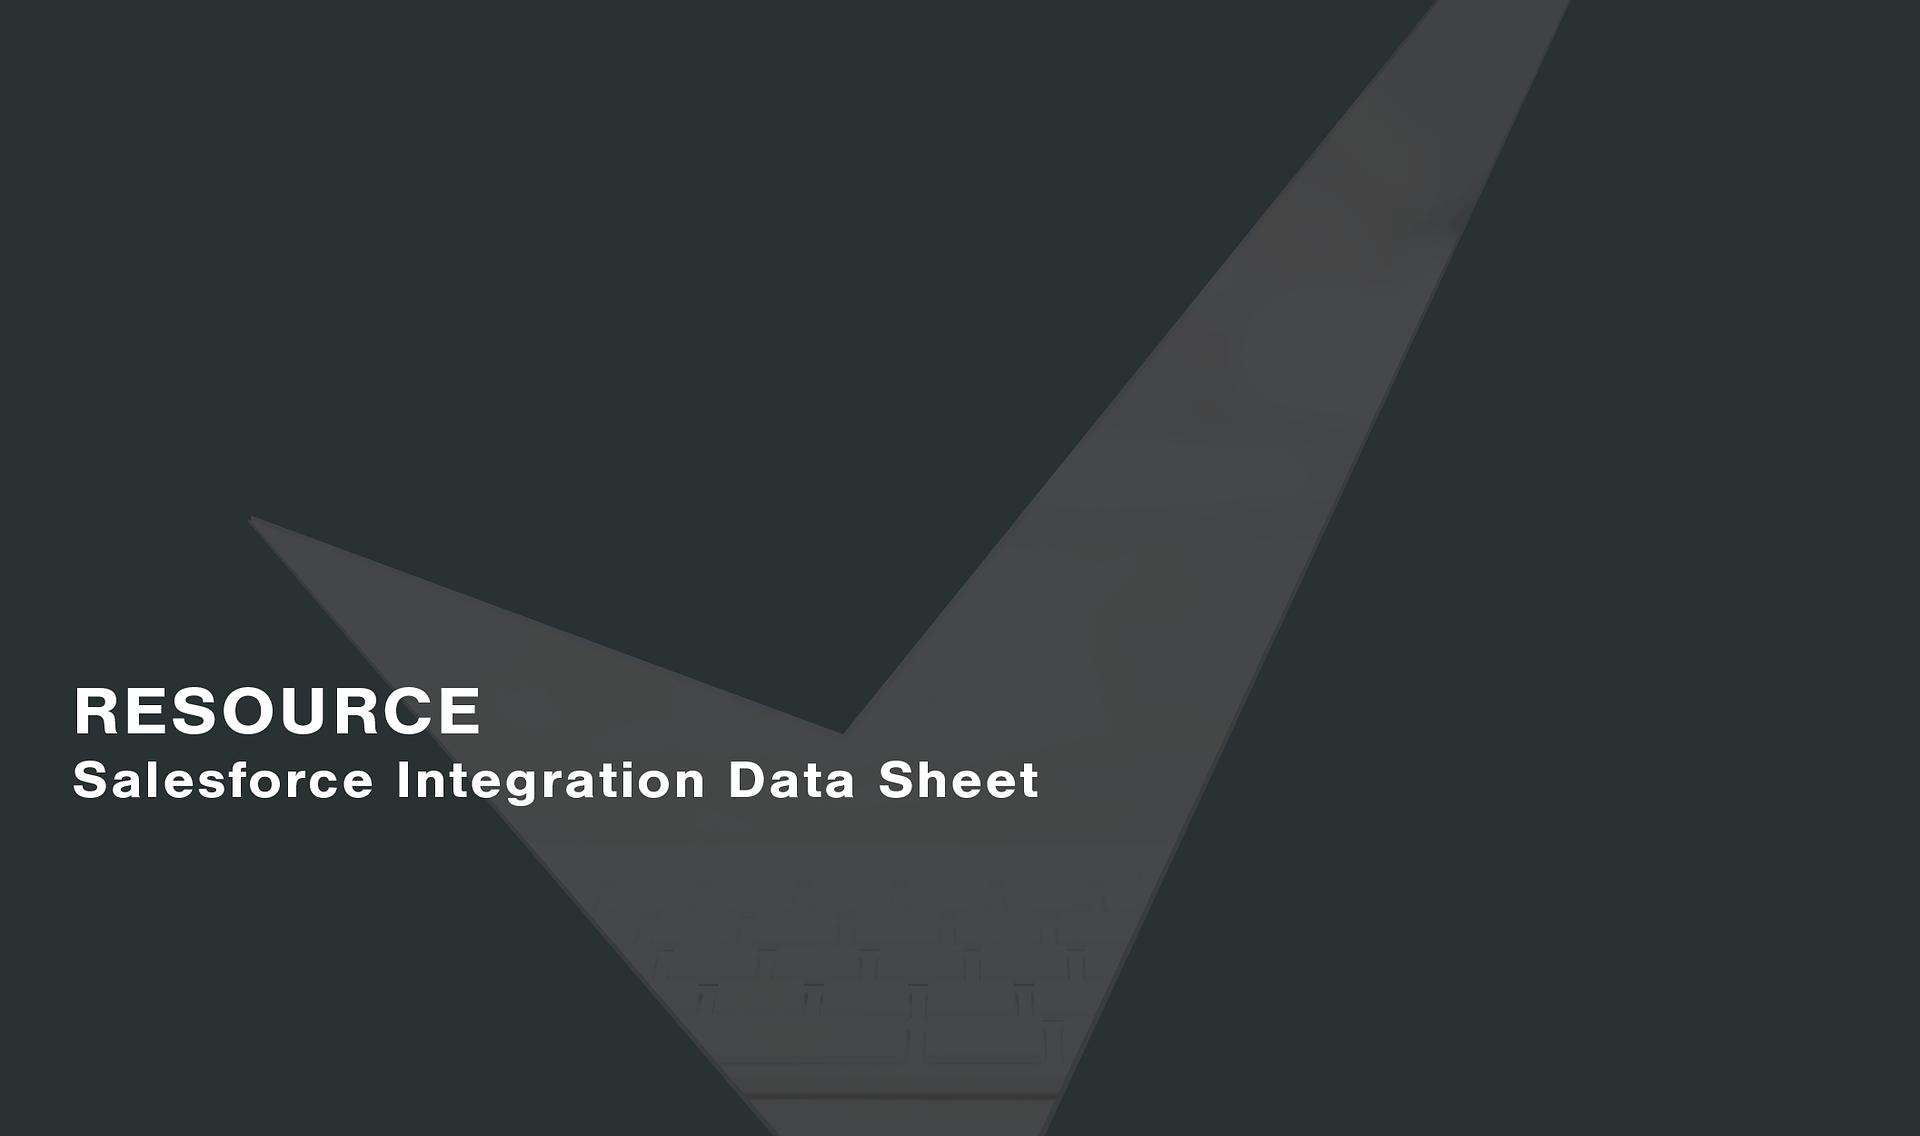 Salesforce-Integration-Data-Sheet